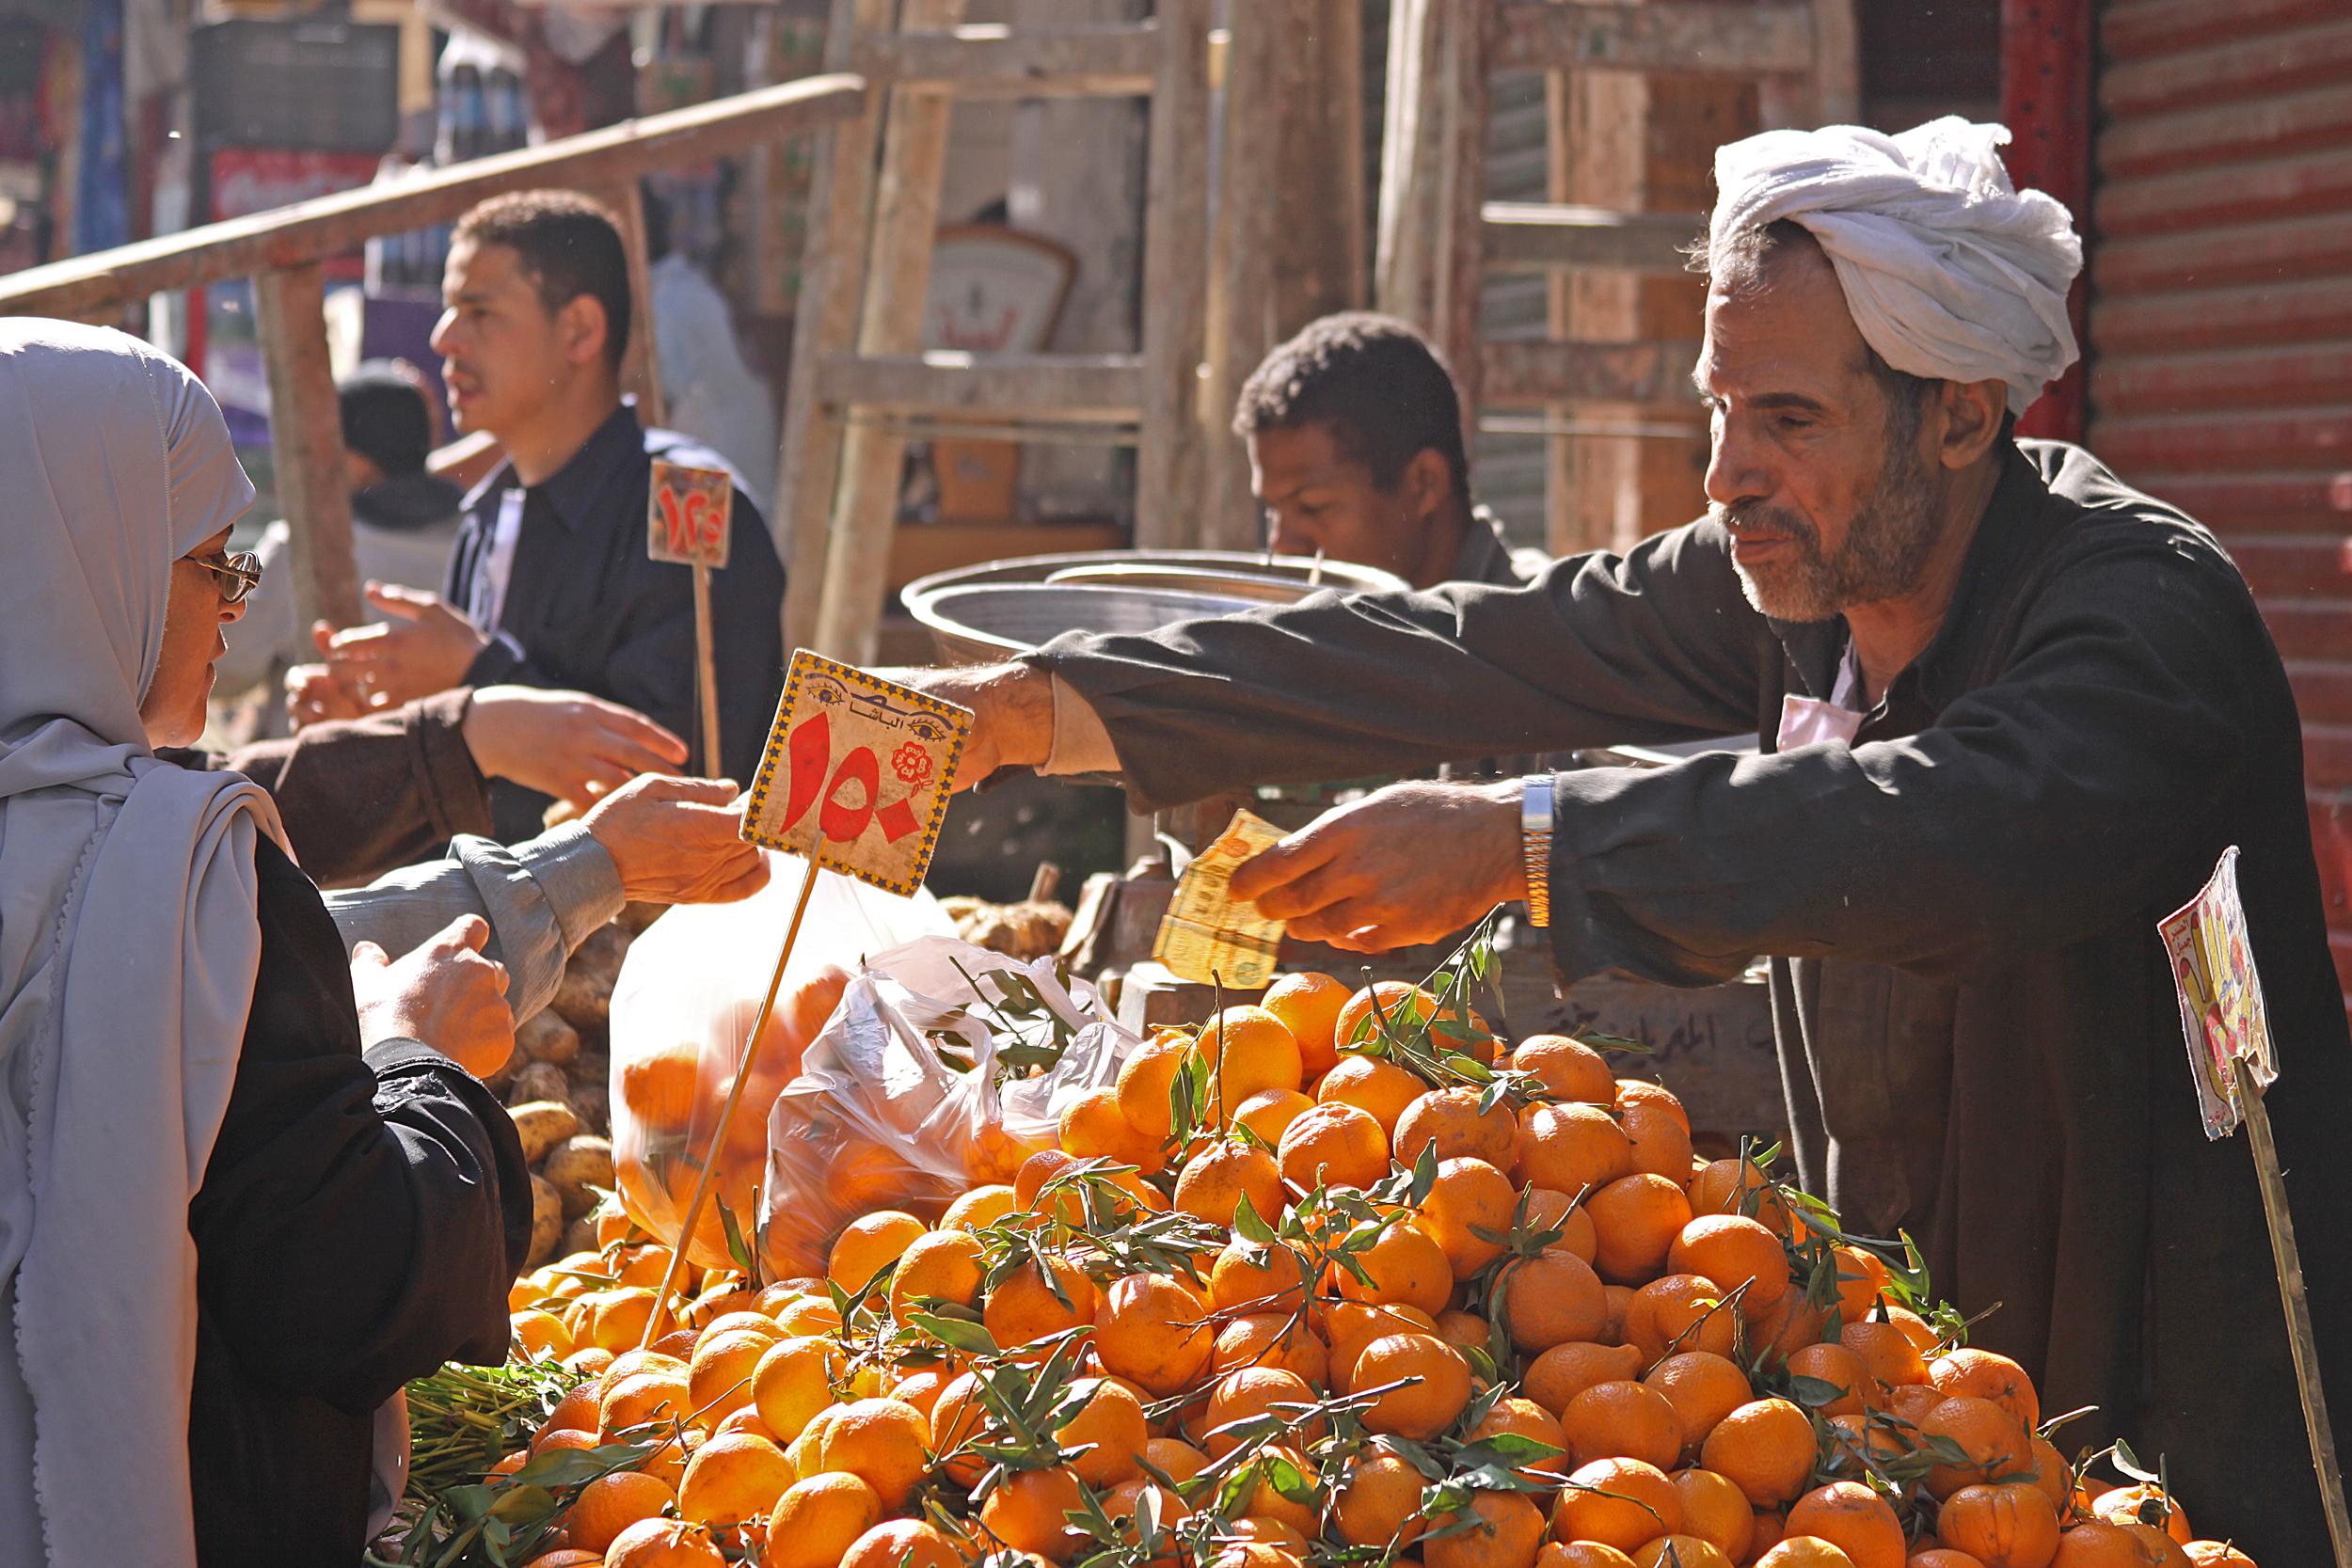 Cairo, Coconut, Wah 093.jpg